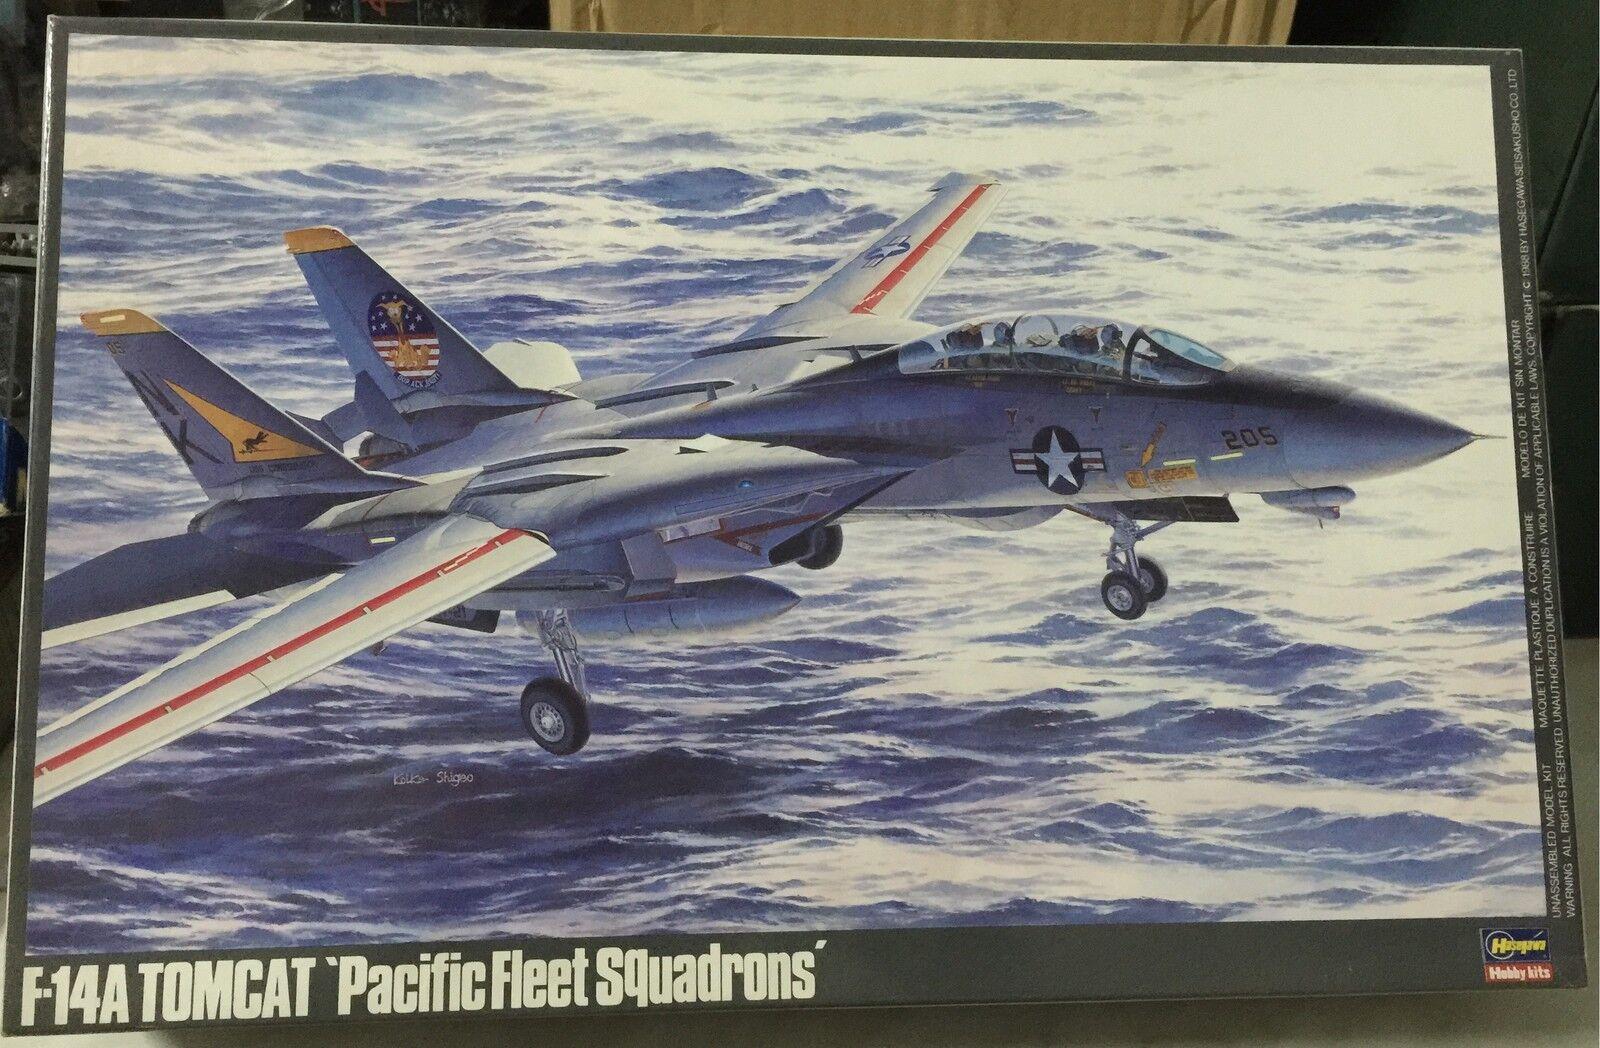 Hasegawa F14A Tomcat Pacifico Feet Squadroni Model Kit Scala 1/48, Nuovo